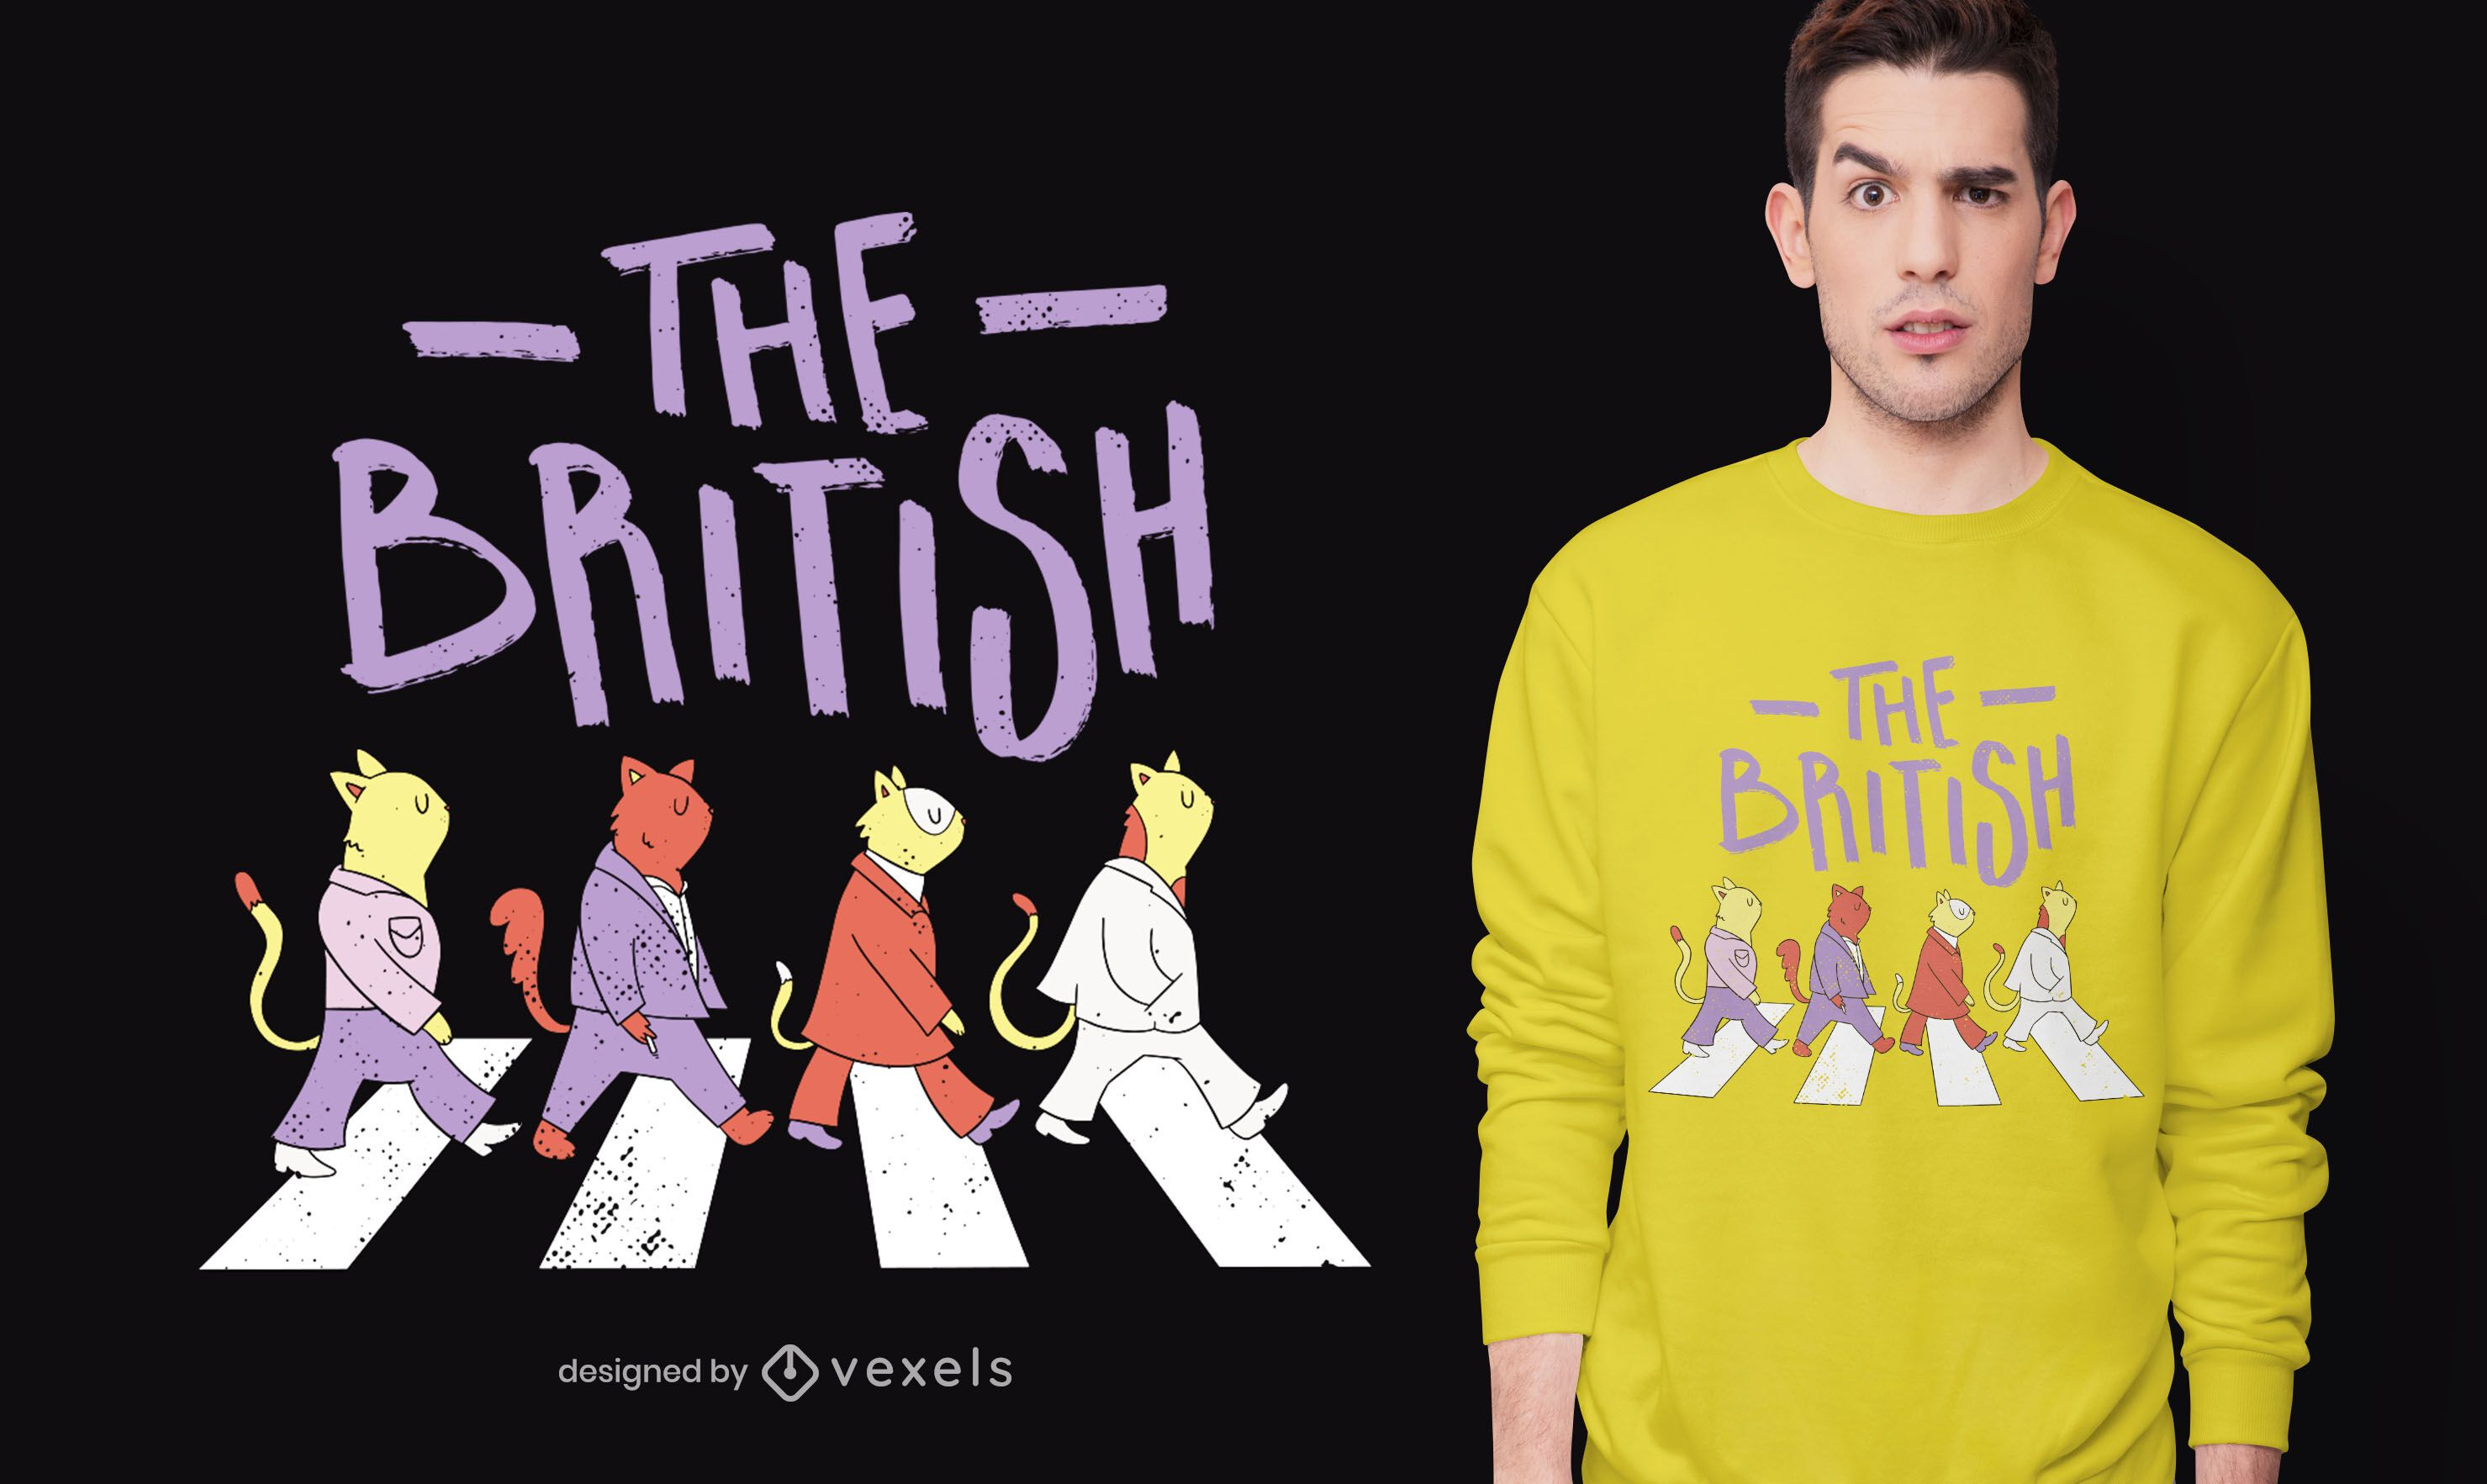 The british t-shirt design